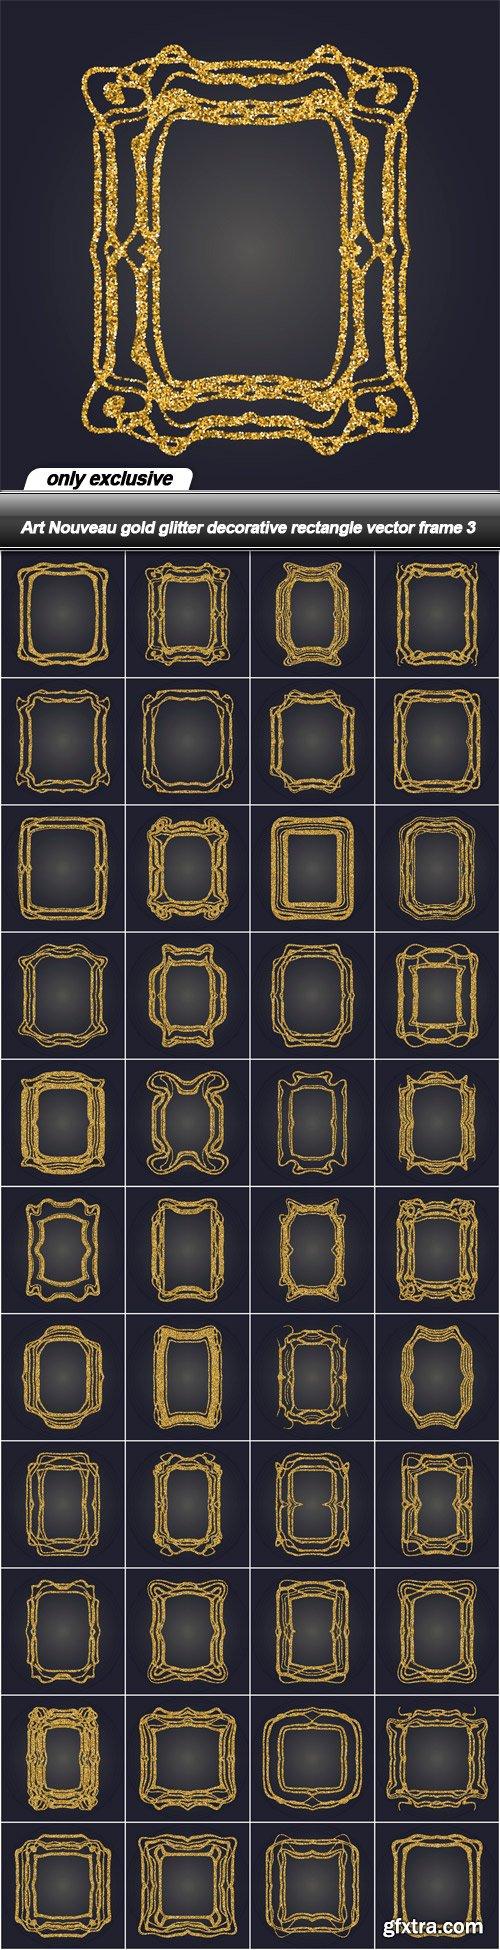 Art Nouveau gold glitter decorative rectangle vector frame 3 - 43 EPS